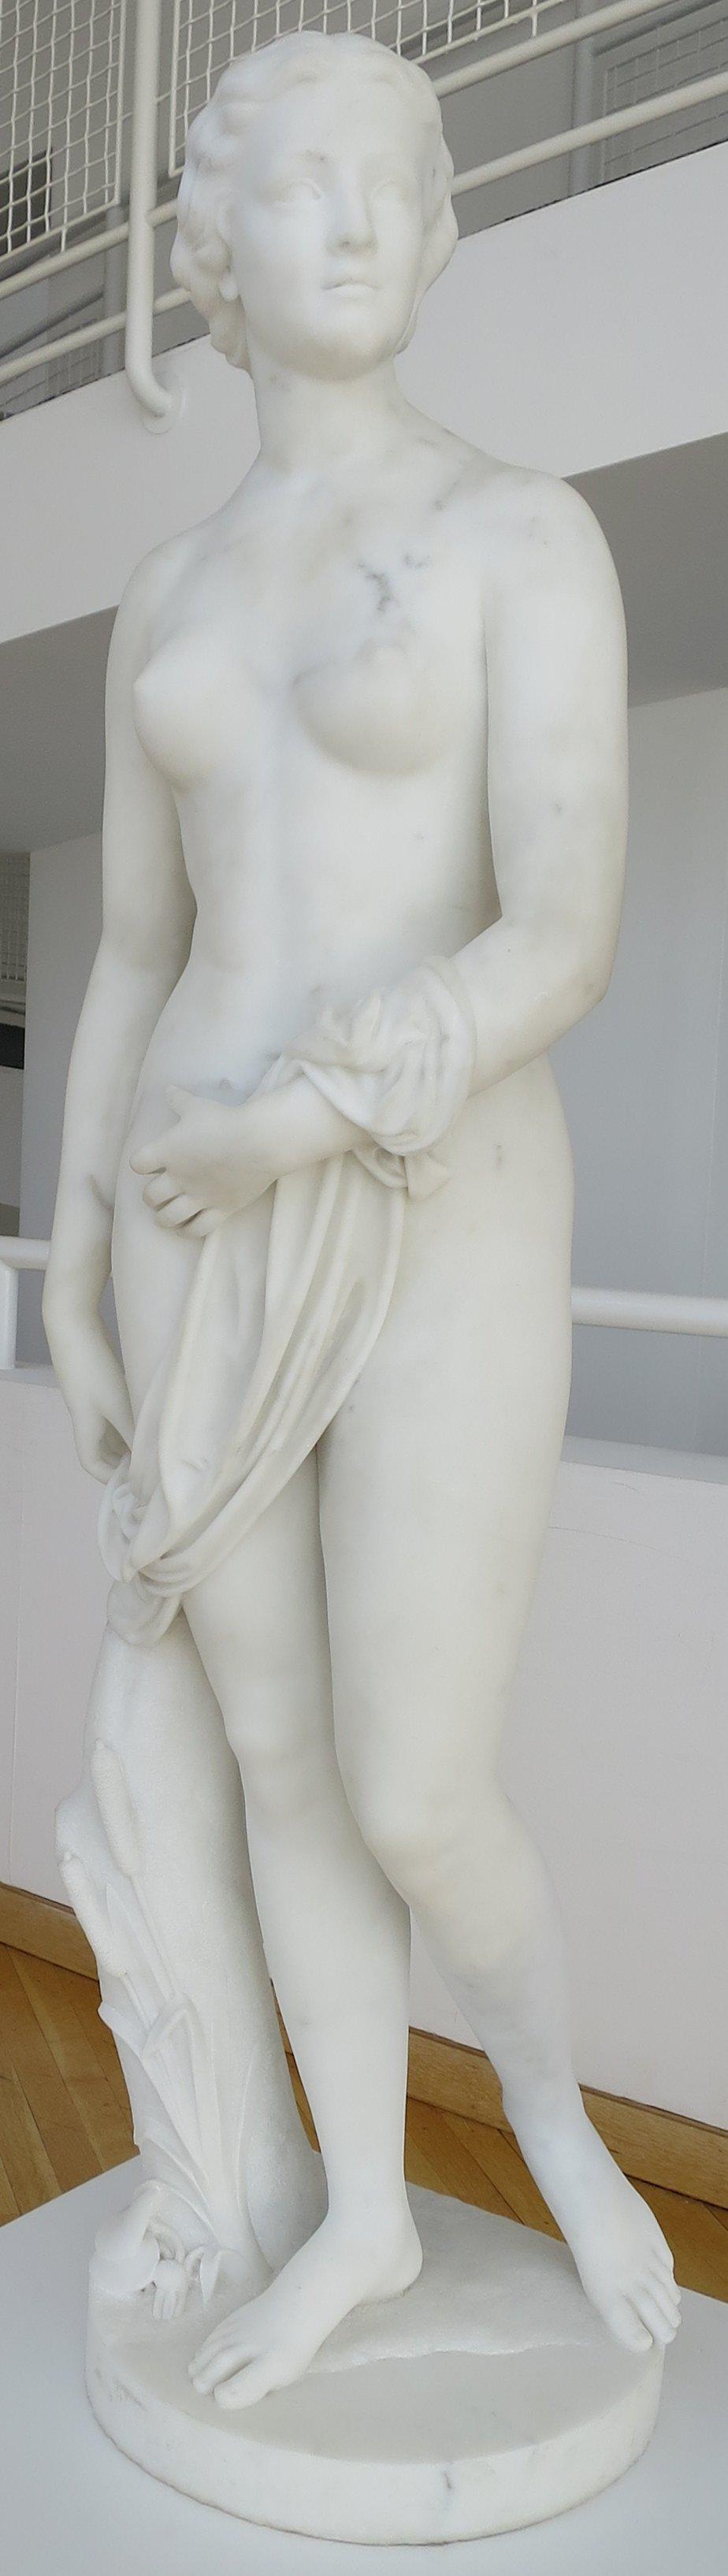 'musidora' by william walcutt, 1868, high museum.jpg